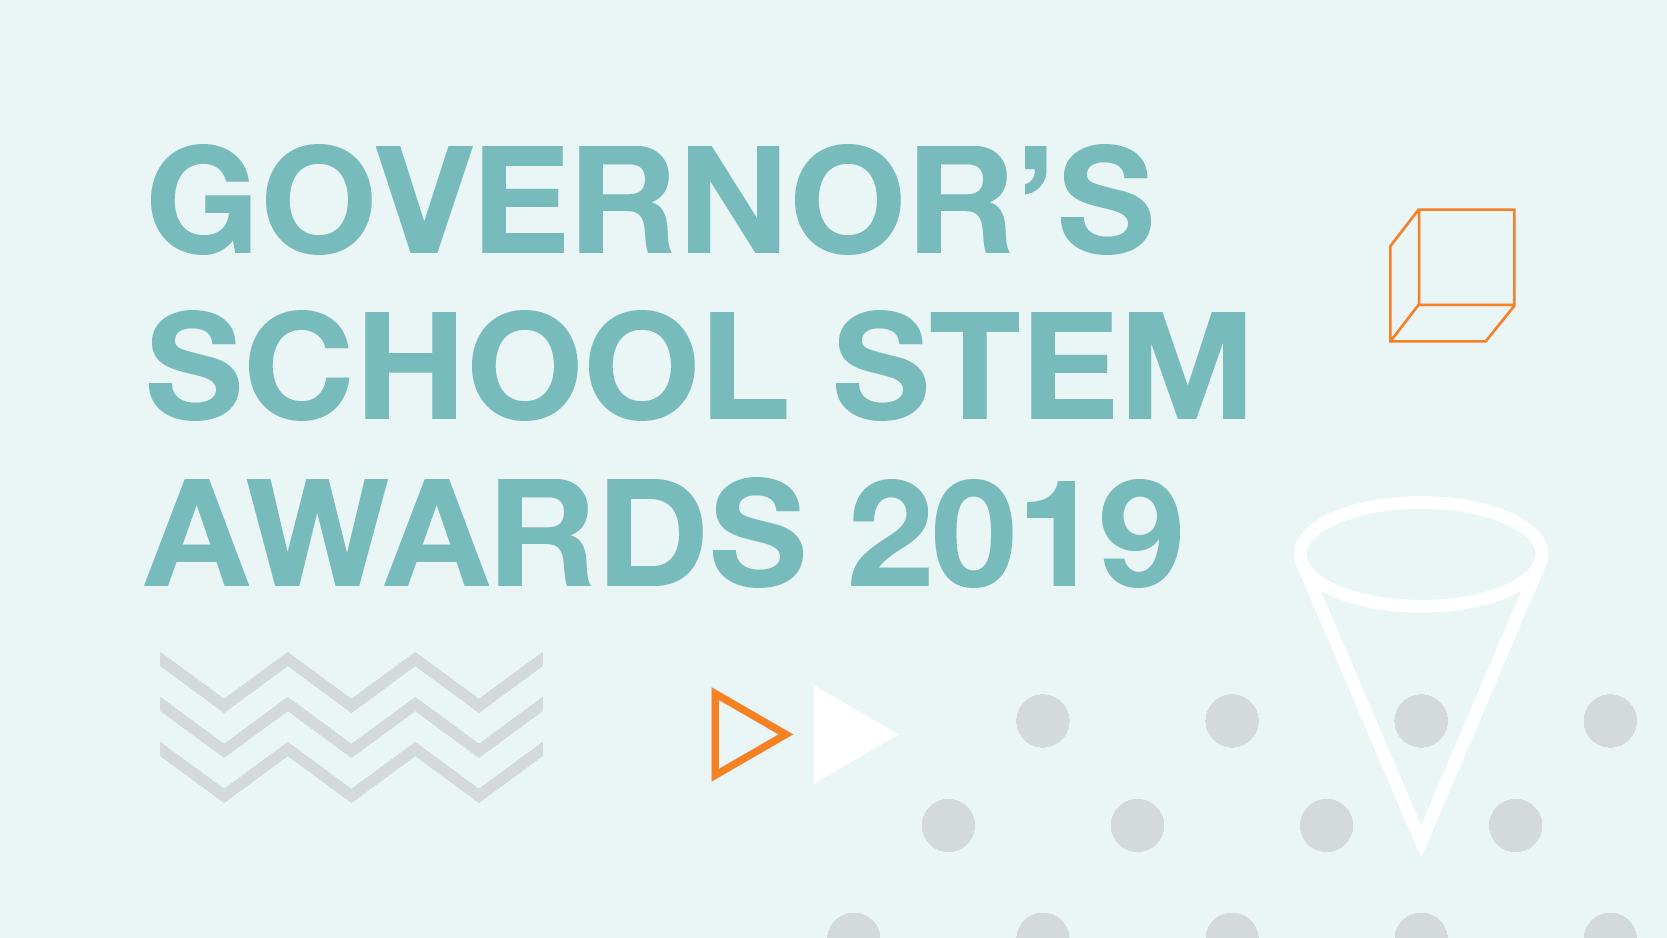 Governors School STEM Awards 2019